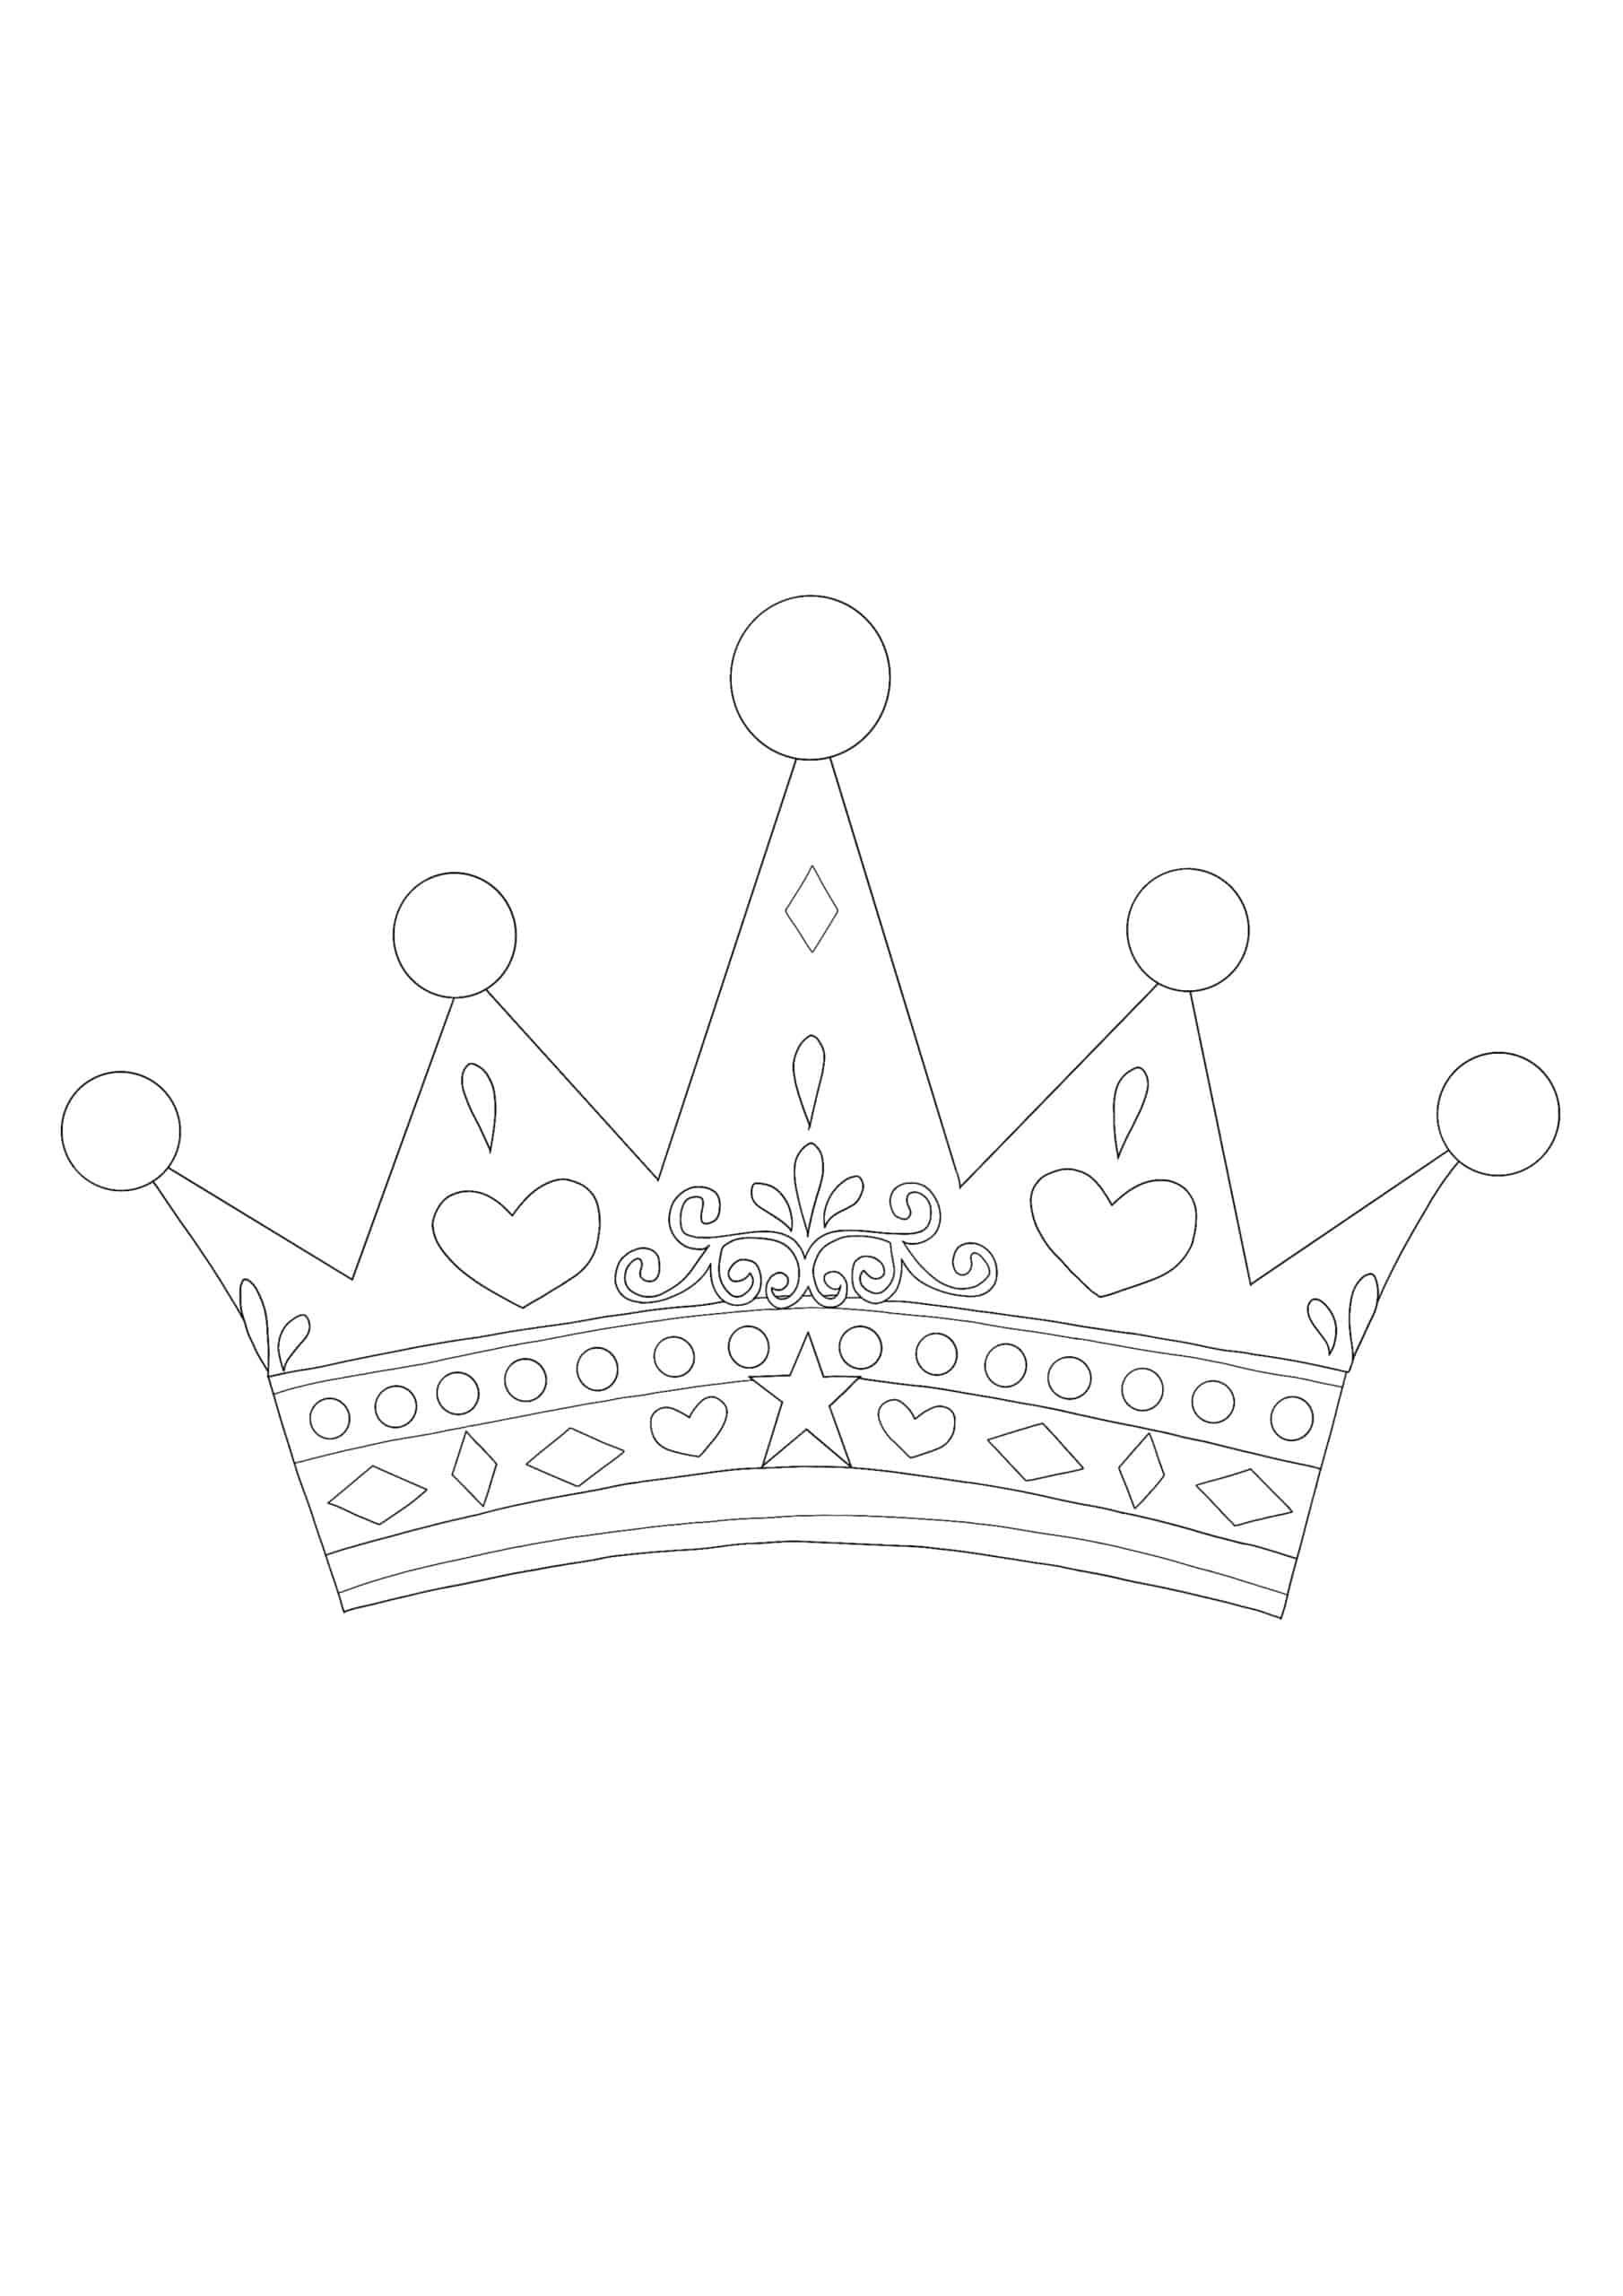 Coloriage Couronne Princesse